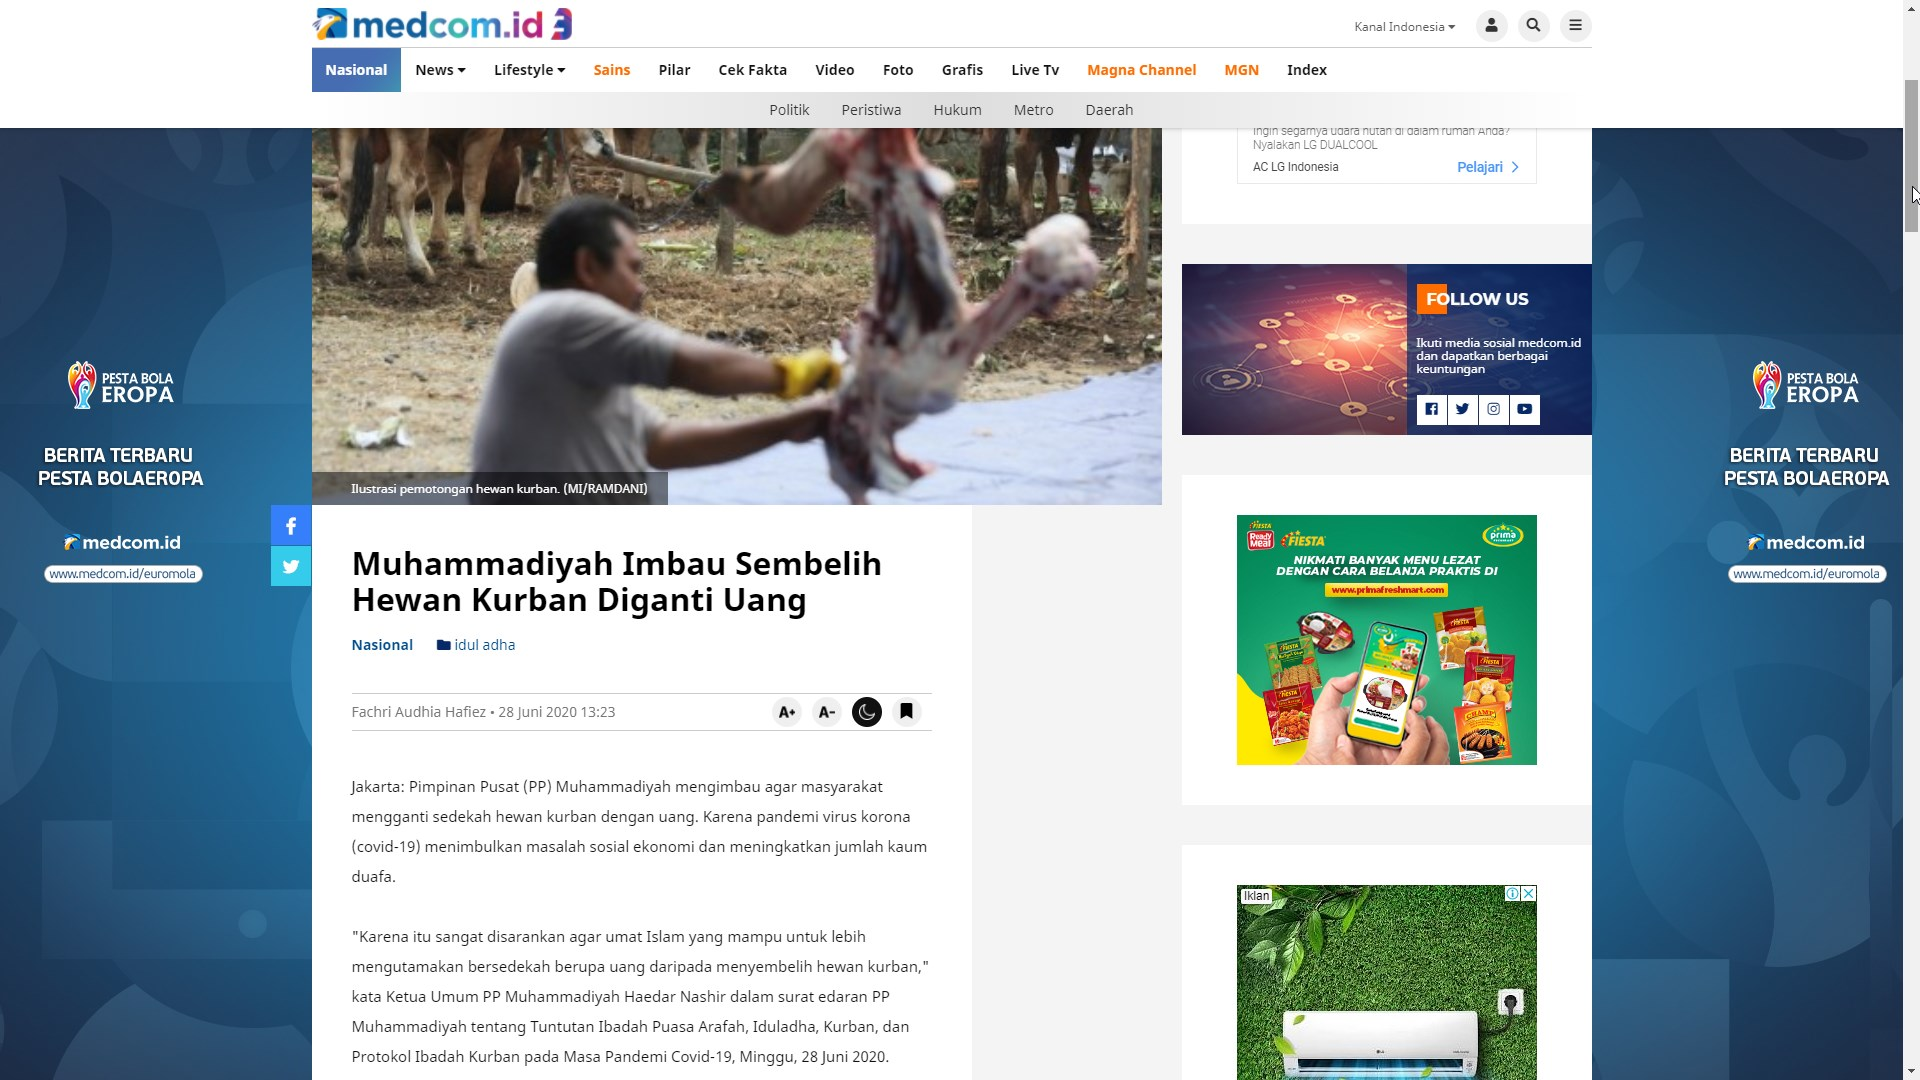 Sumber: https://www.medcom.id/nasional/peristiwa/ZkeBxx7K-muhammadiyah-imbau-sembelih-hewan-kurban-diganti-uang